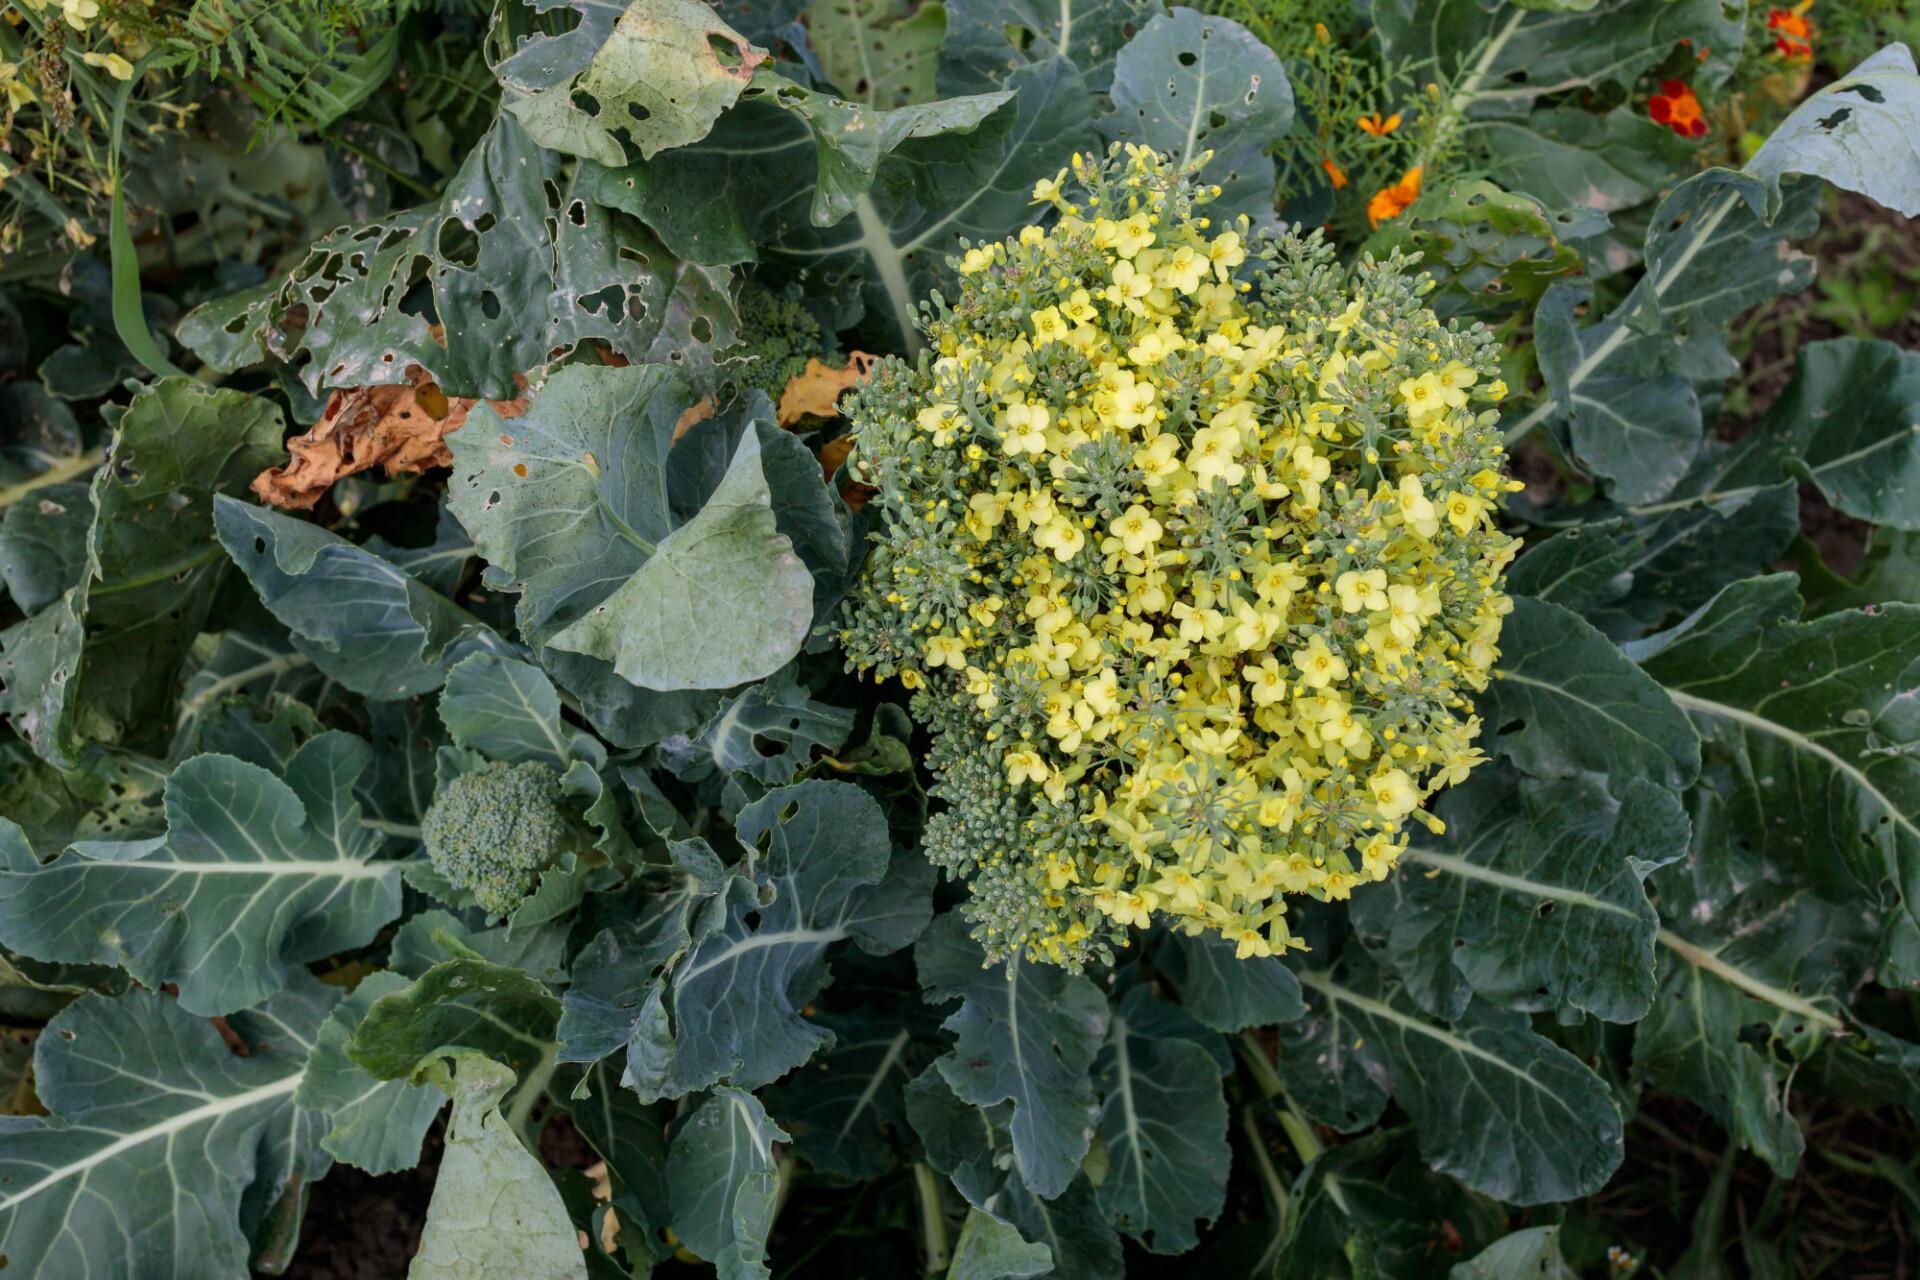 Flowering broccoli grows in the garden